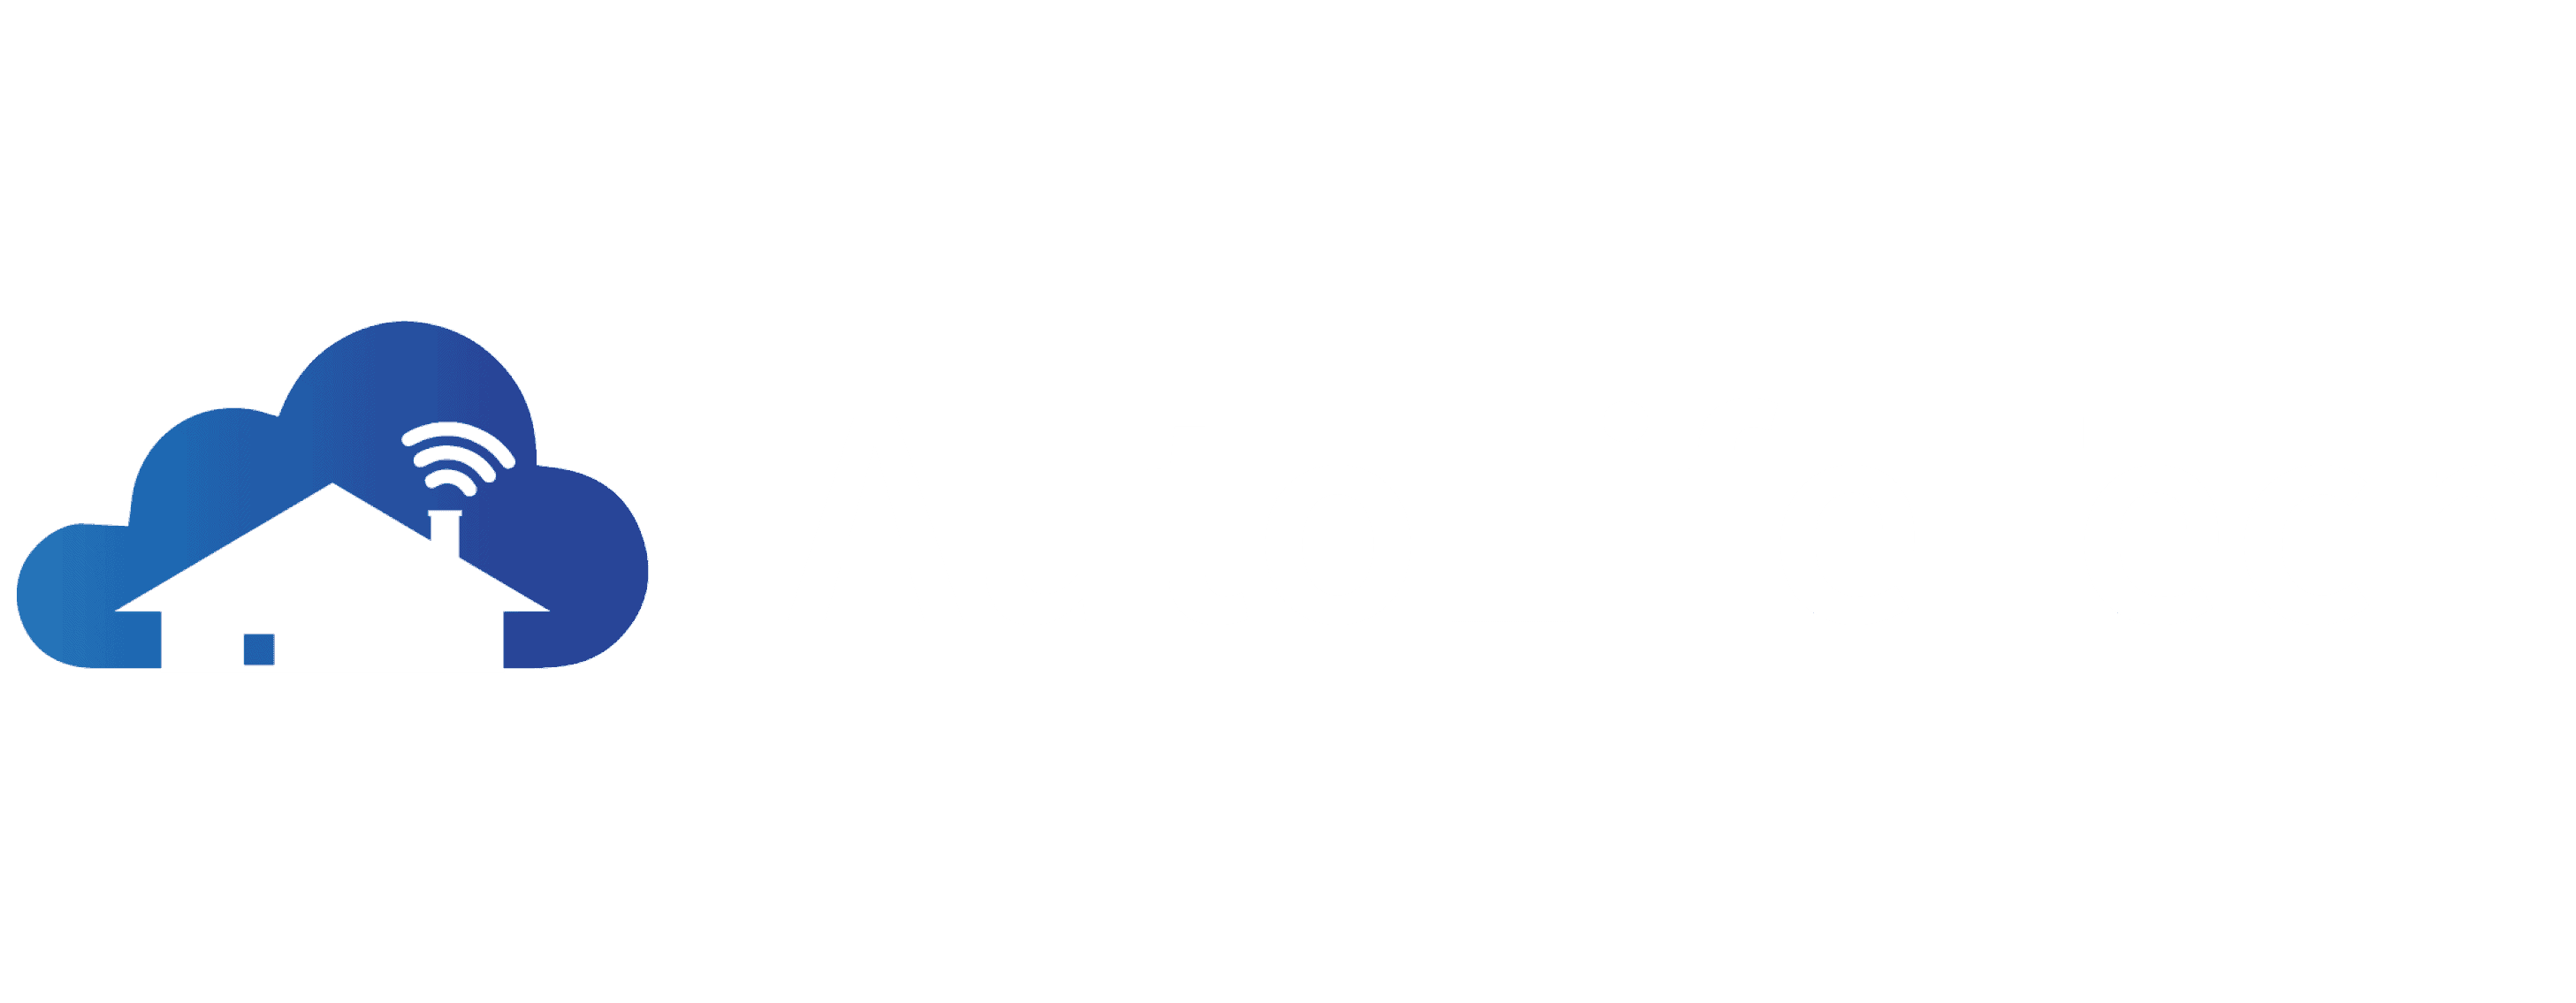 AutoLifeTech